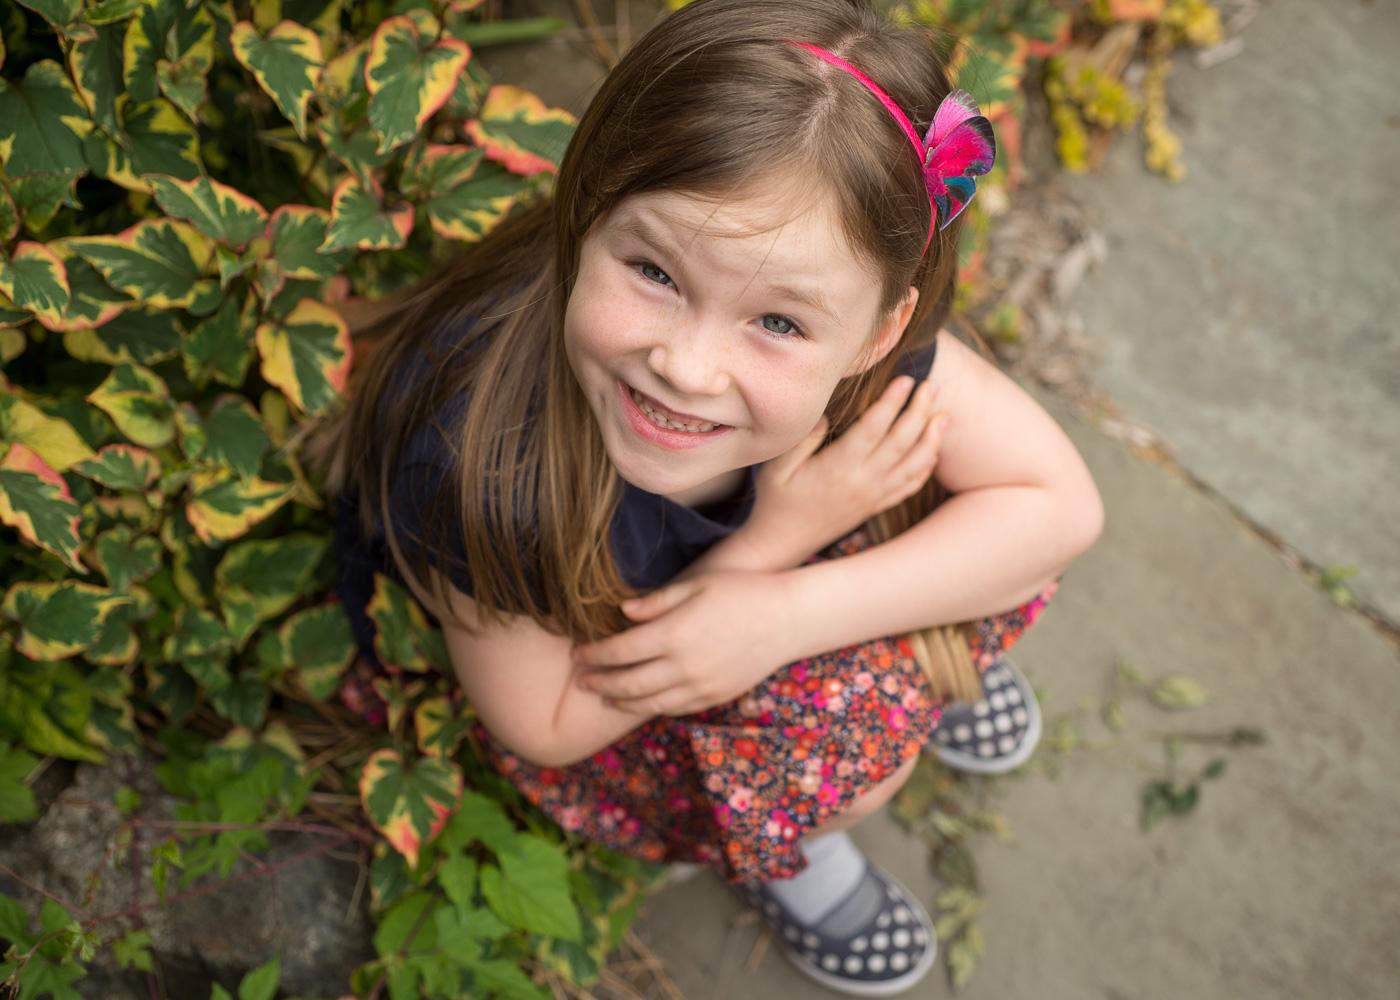 Child portrait photography - Brooklyn